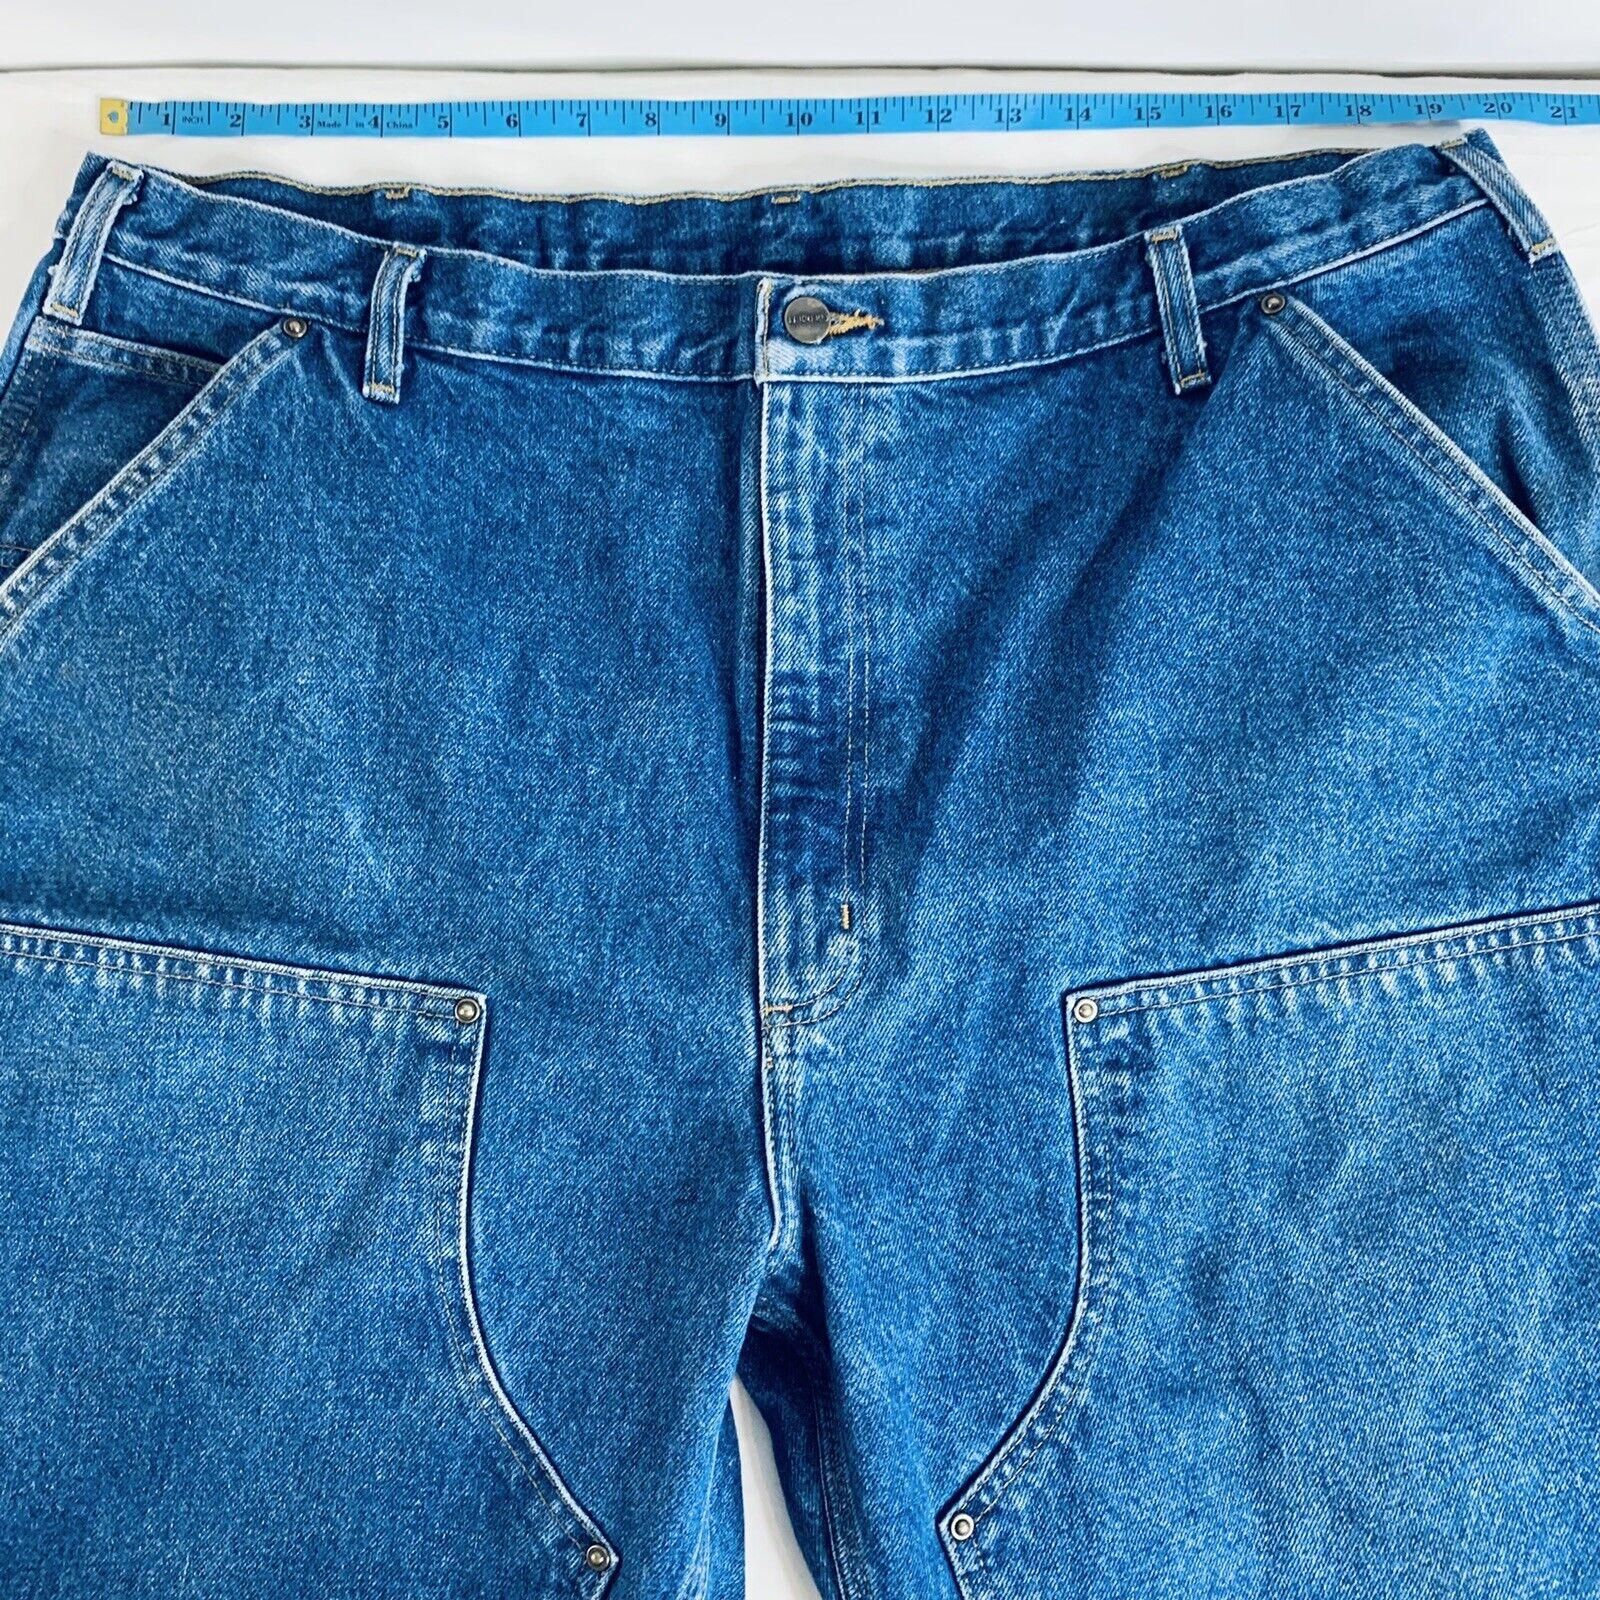 Carhartt Double Knee Jeans Size 42x32 Denim Blue … - image 1